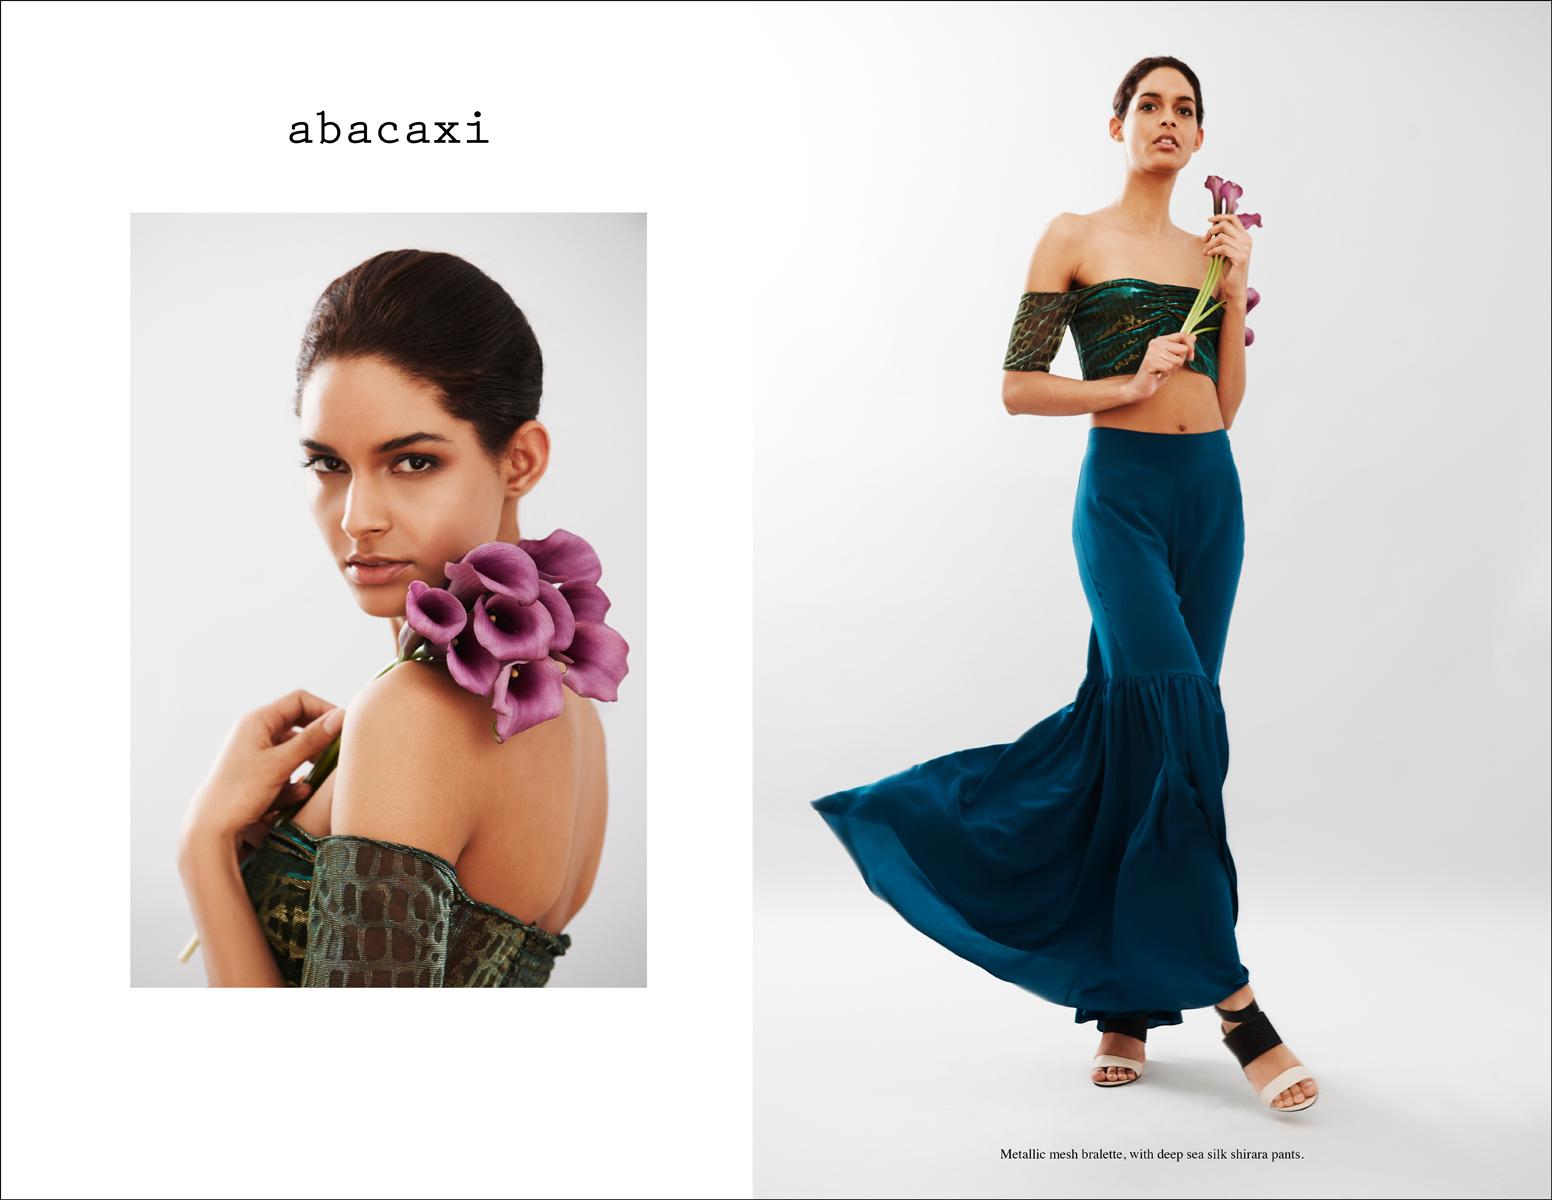 Abacaxi Metallic mesh bralette, with deep sea silk shirara pants.jpg